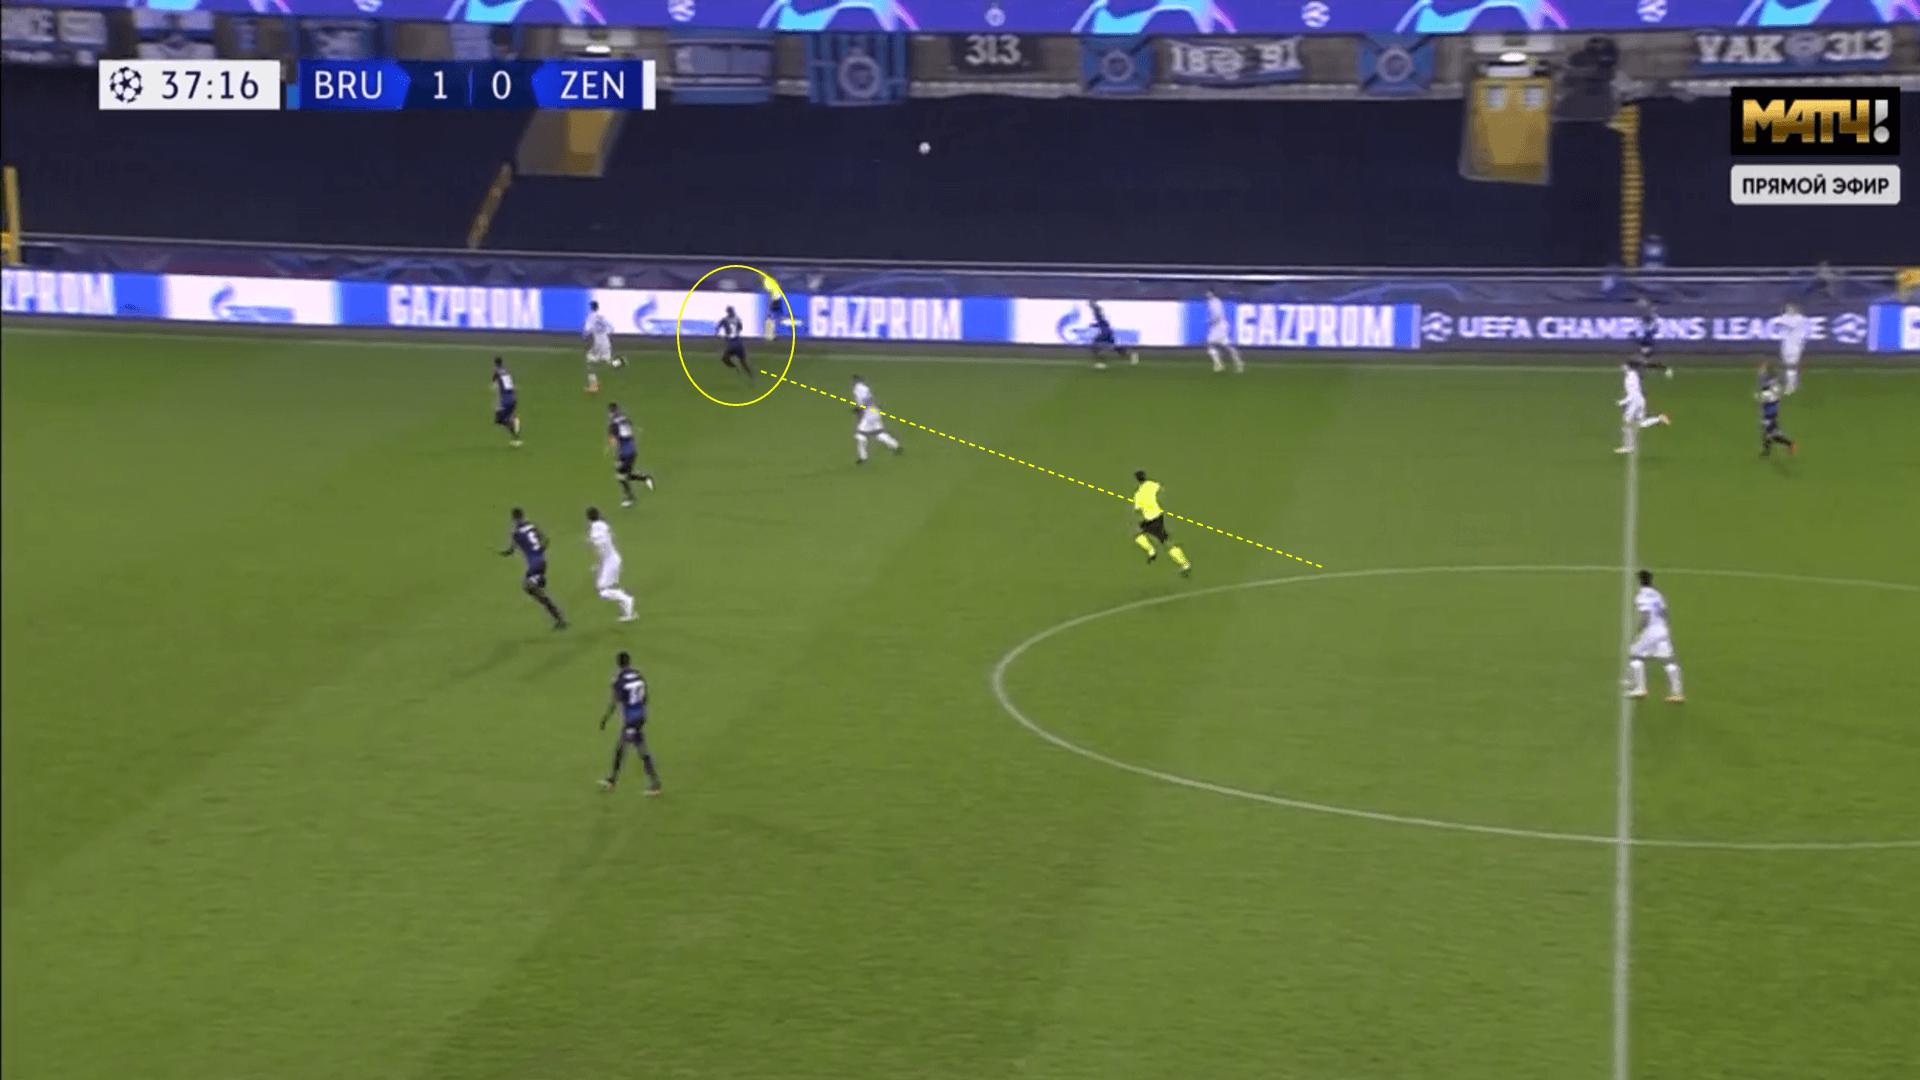 UEFA Champions League 2020/21 - Club Brugge v Zenit St Petersburg - tactical analysis tactics